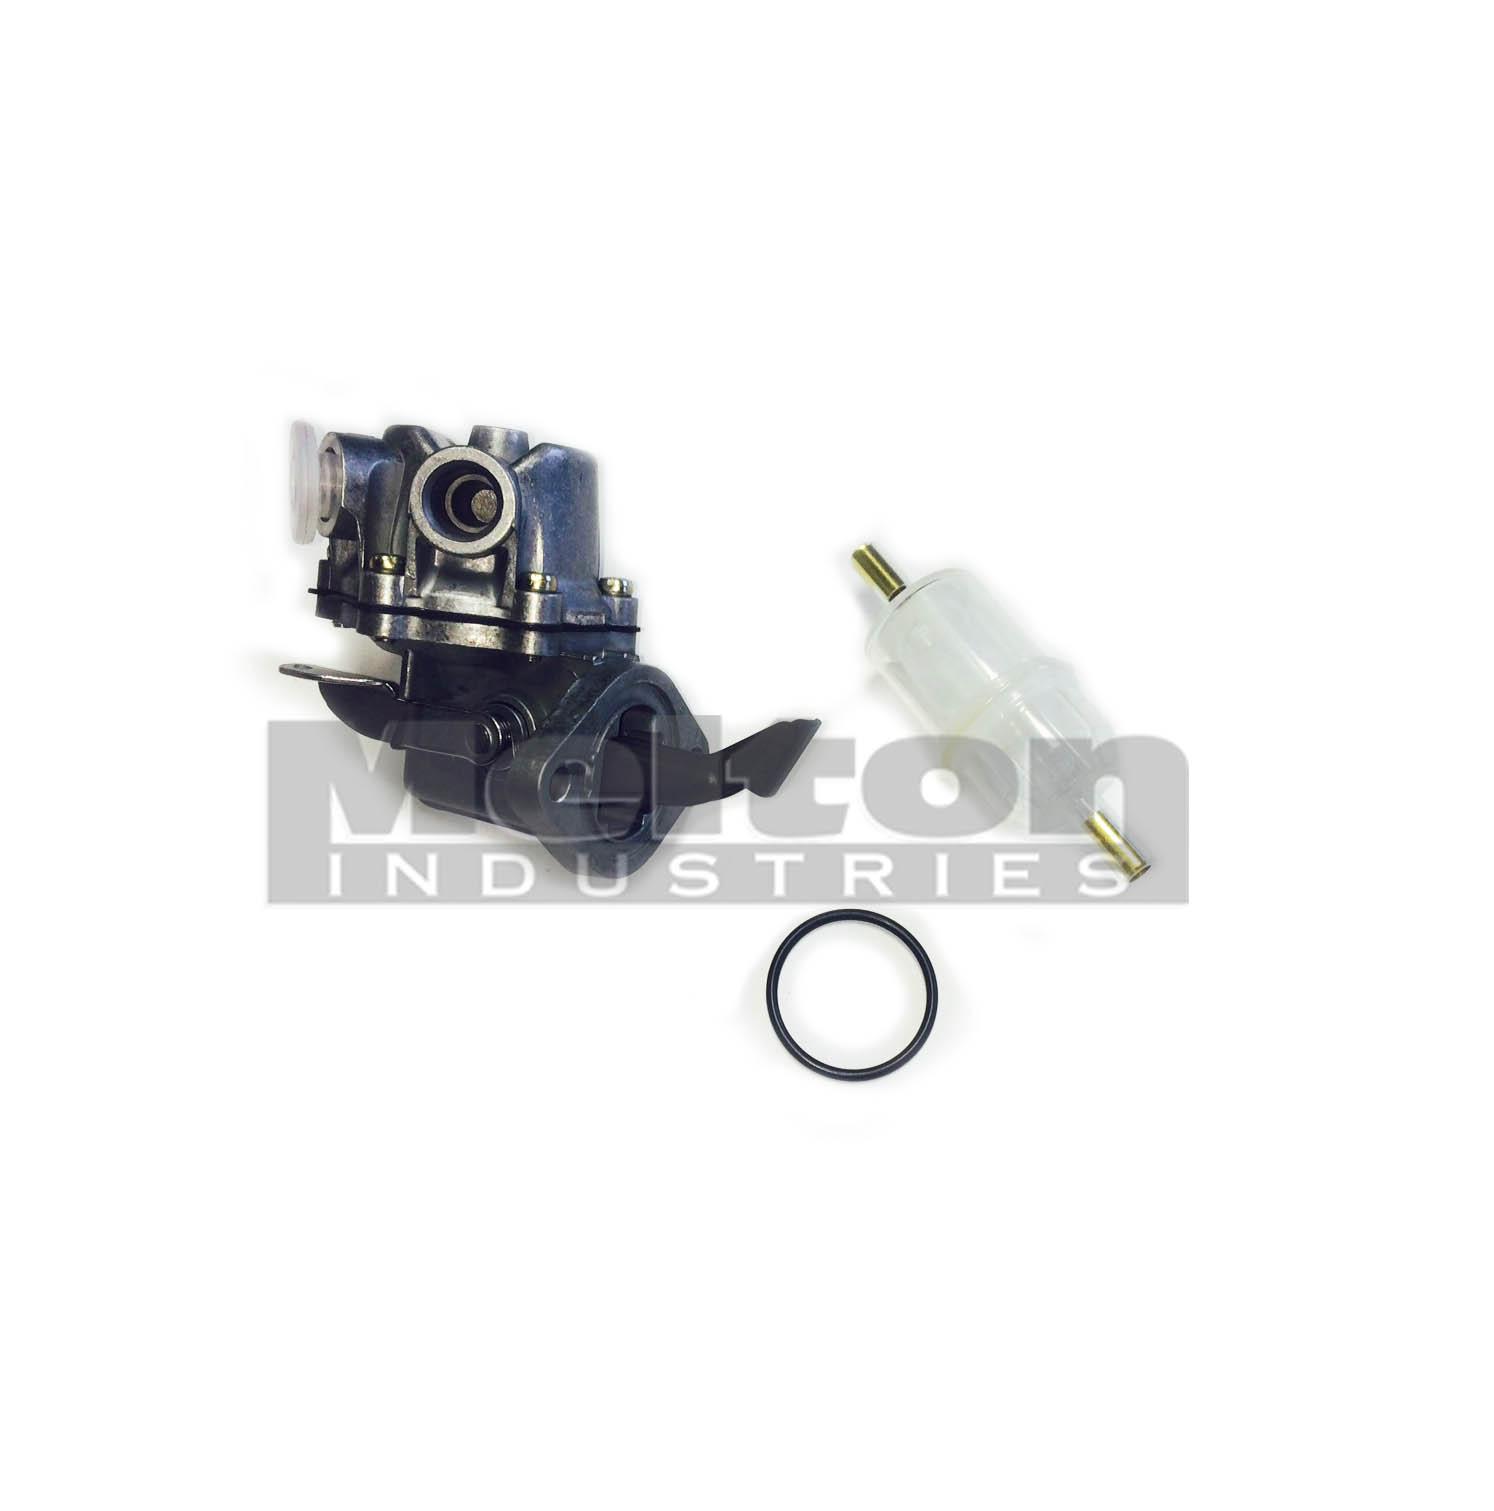 Hatz Fuel Pump Diesel Wiring Diagrams Engine Diagram Feed Filter Kit 01478902 Z790